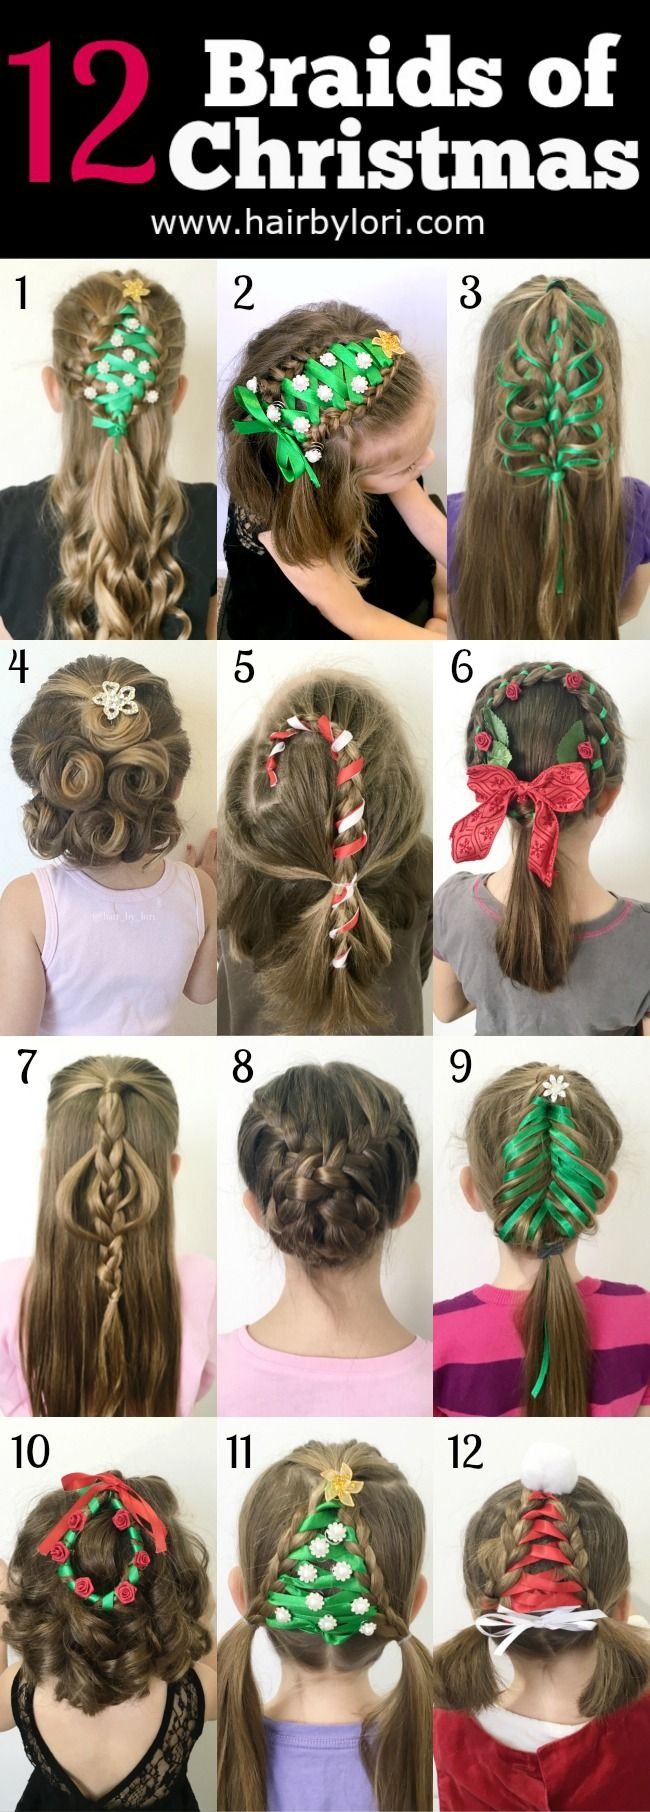 Christmas braids hair pinterest tutorials holidays and hair style